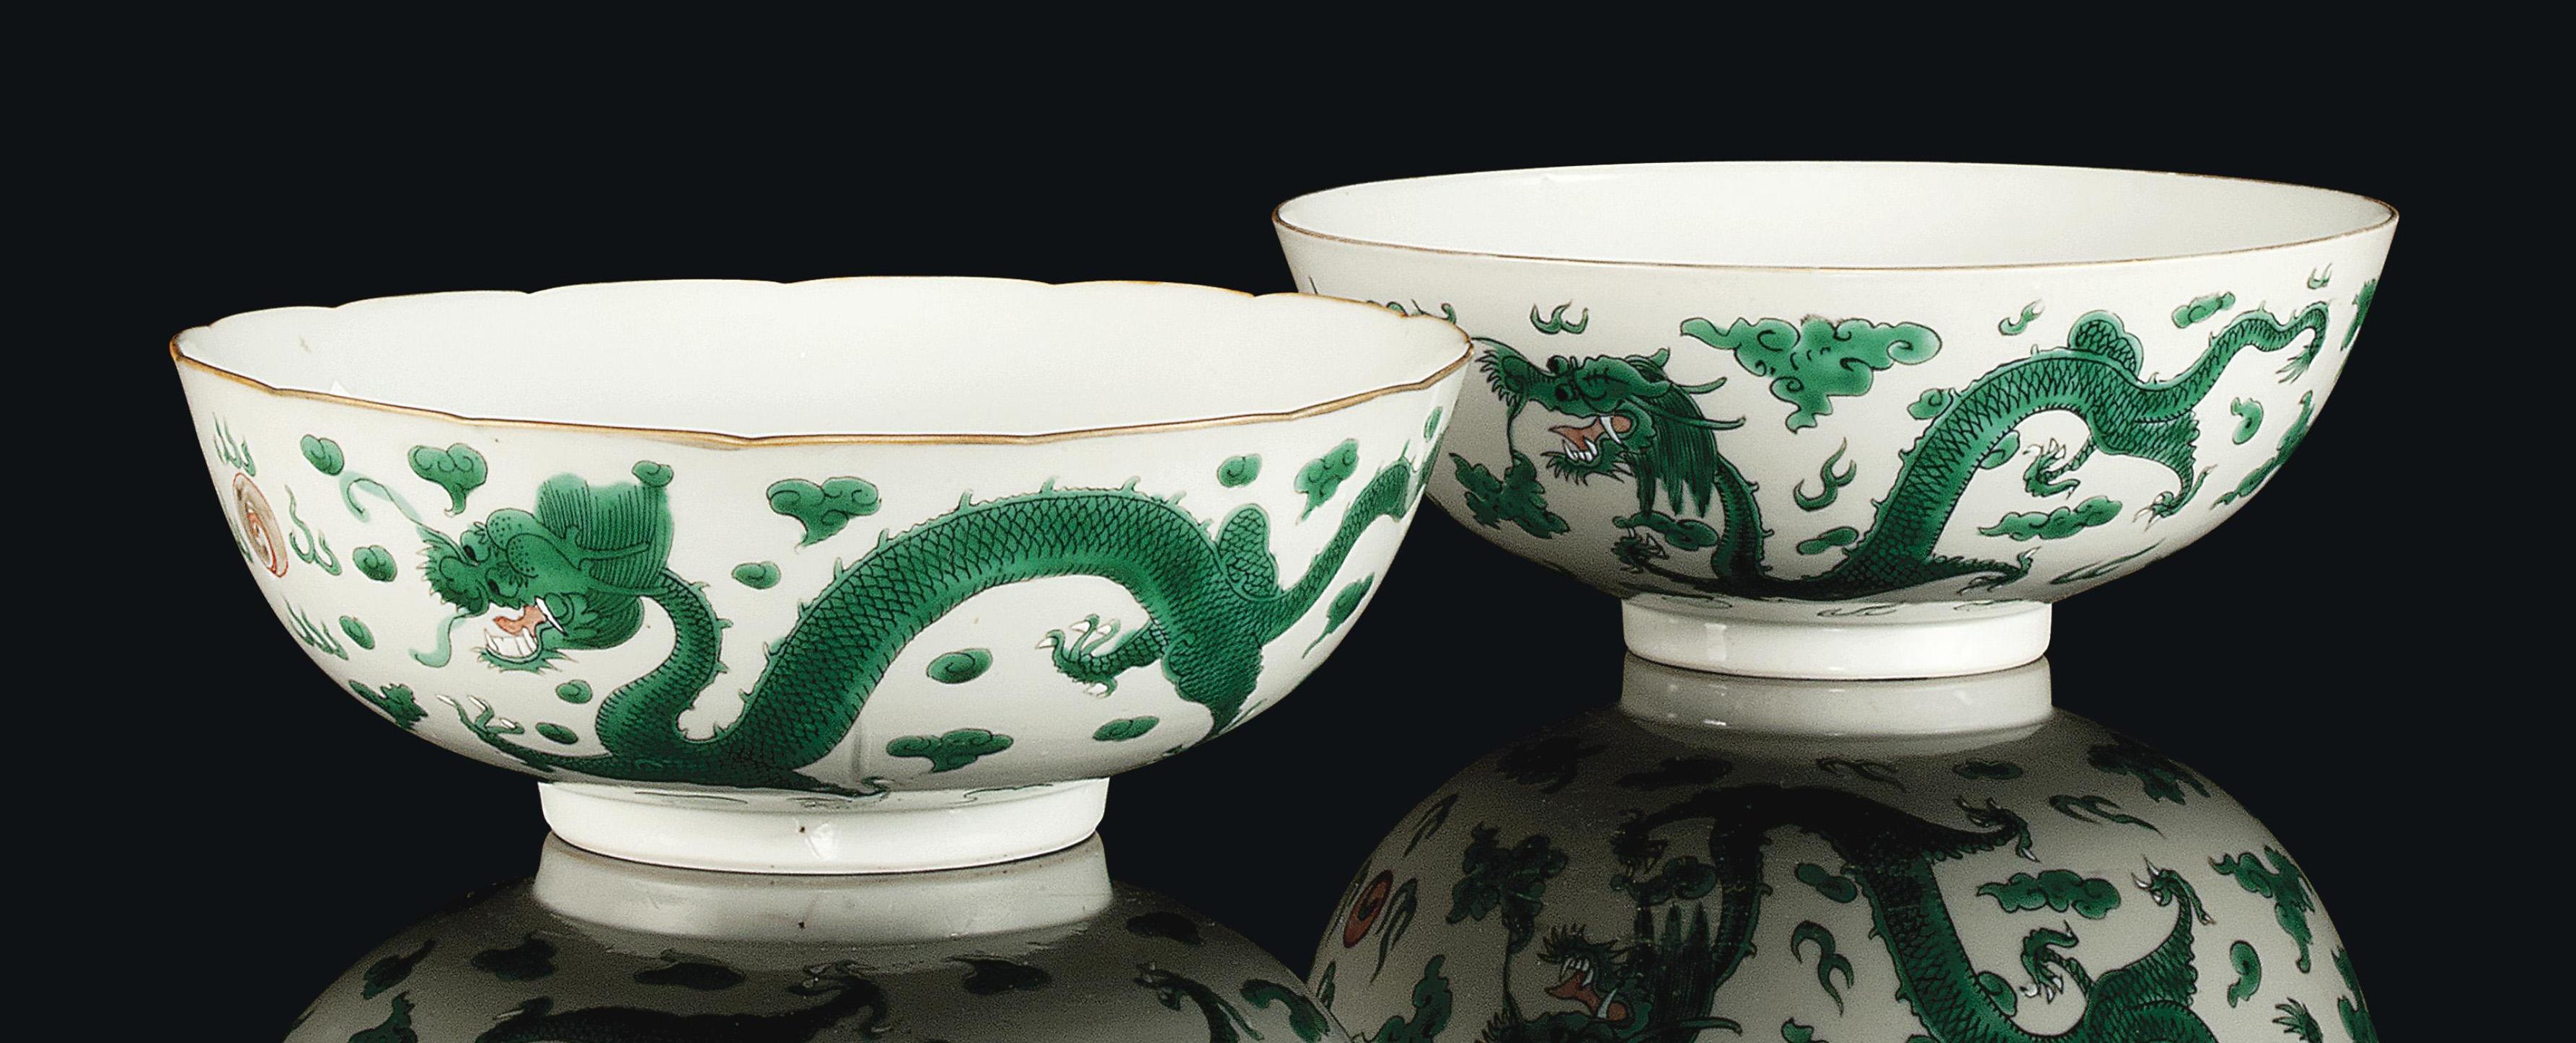 TWO CHINESE GREEN ENAMEL DECOR